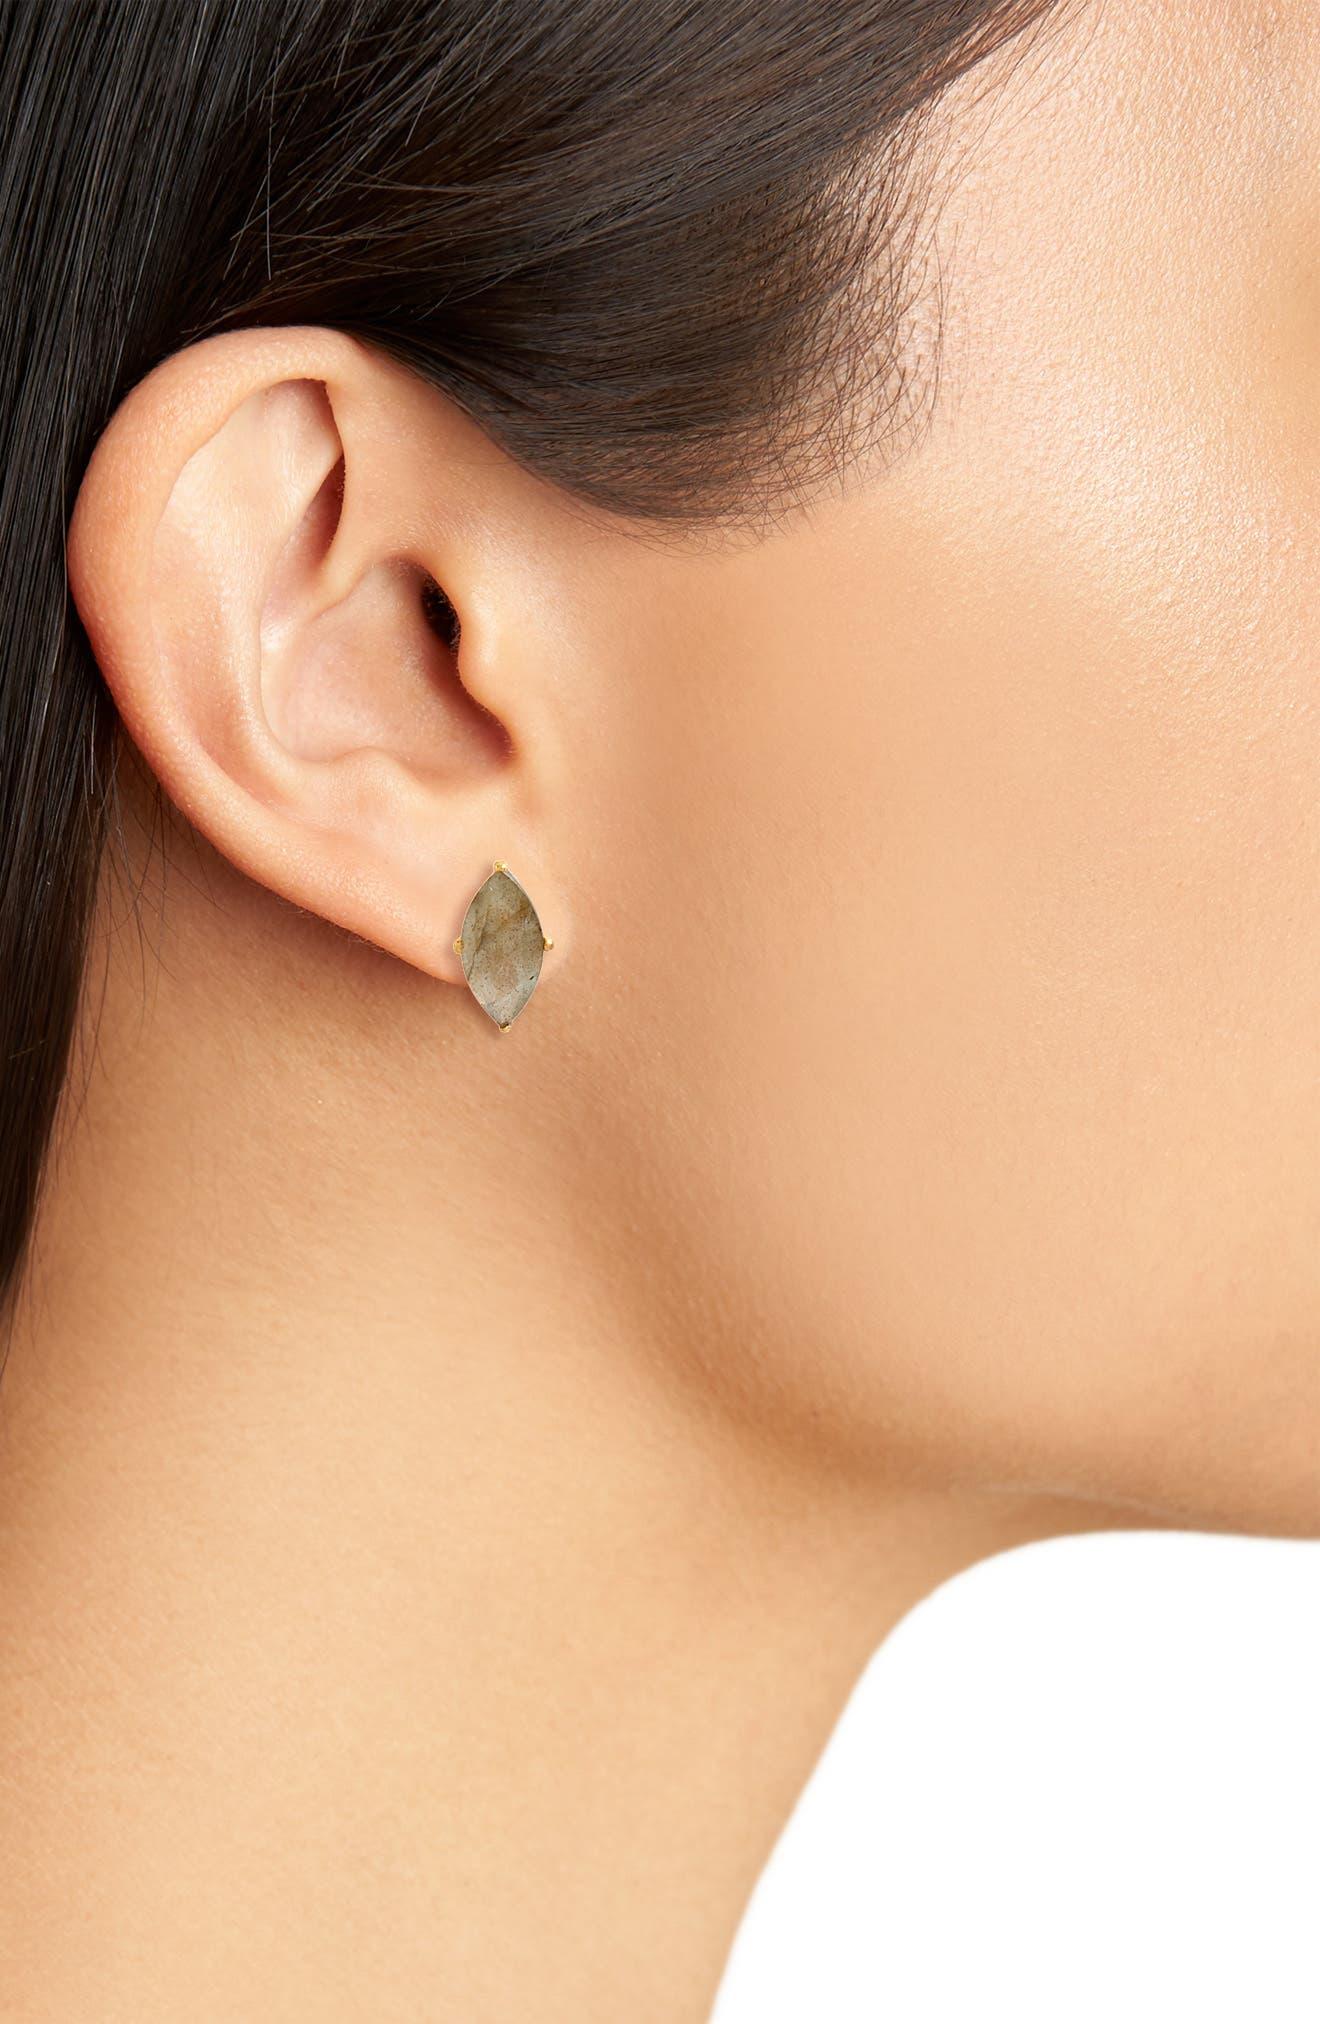 Lotus Stud Earrings,                             Alternate thumbnail 2, color,                             Labradorite/ Gold